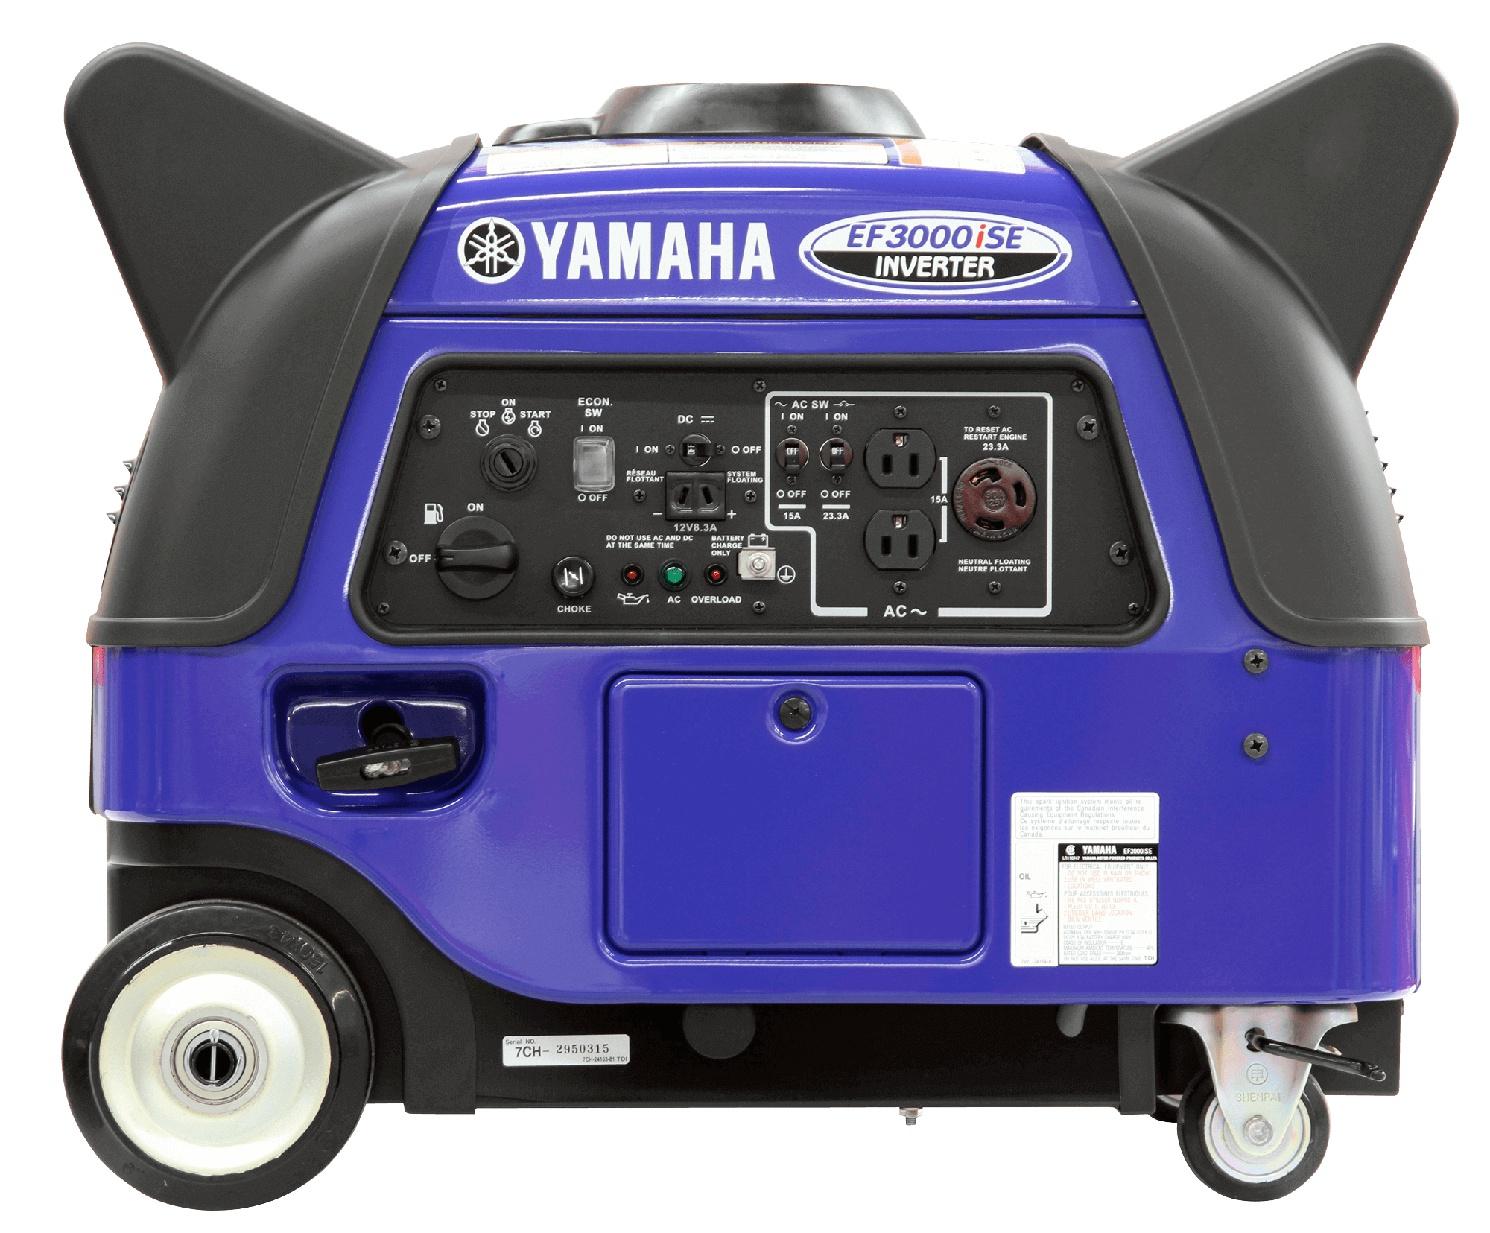 Yamaha Inverter Series EF3000ISE